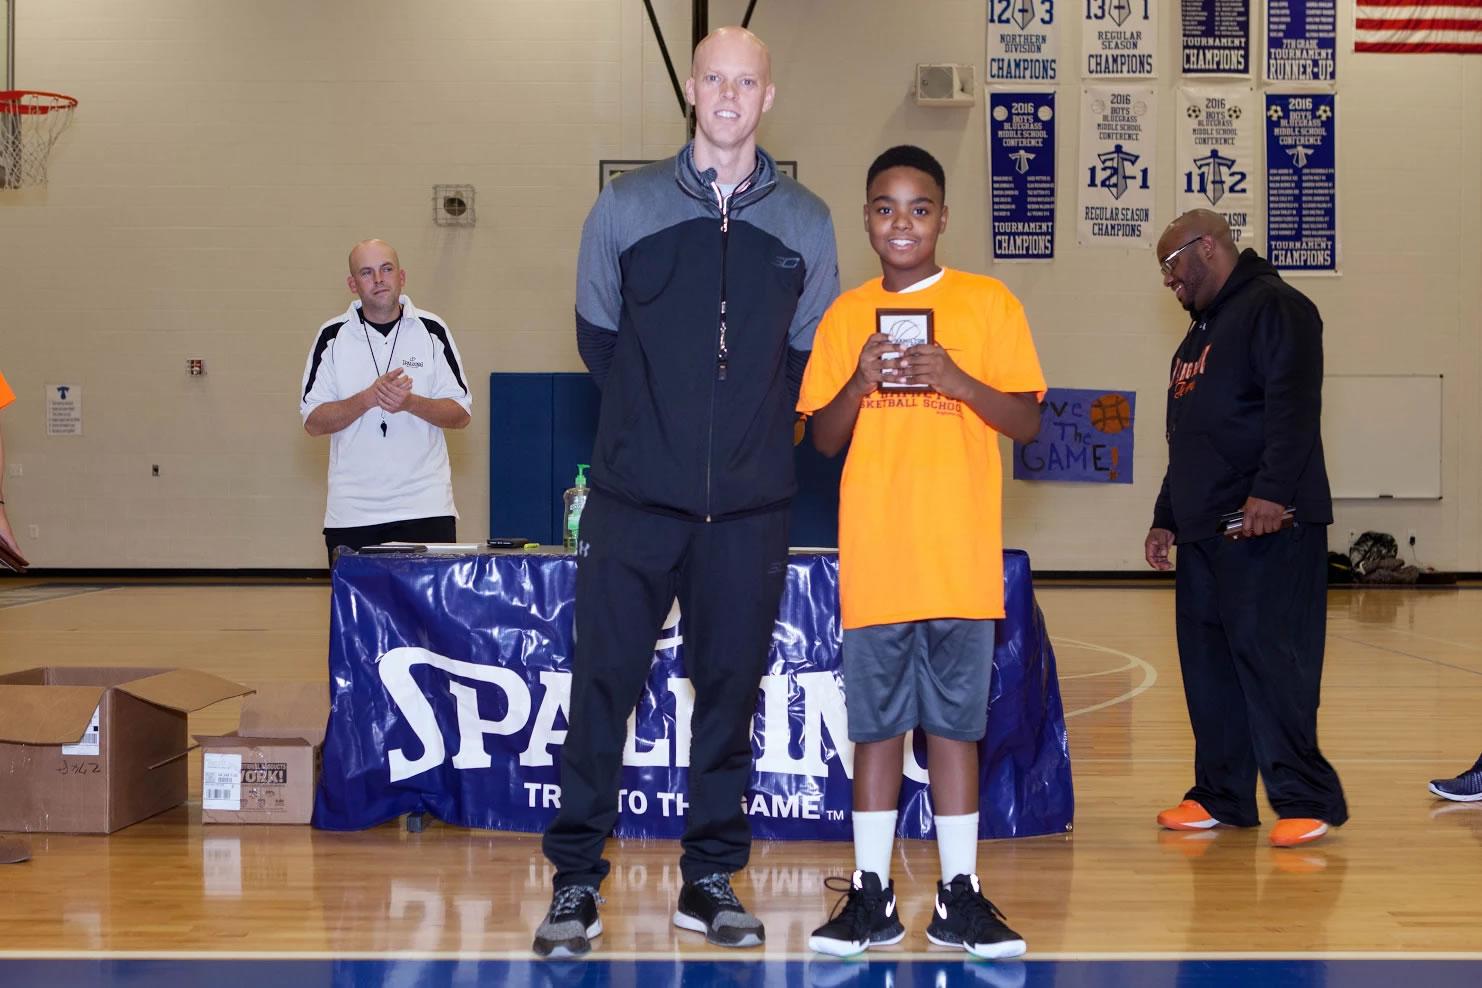 Eastern Invitational Basketball Camp 2018 - OneLetter.CO